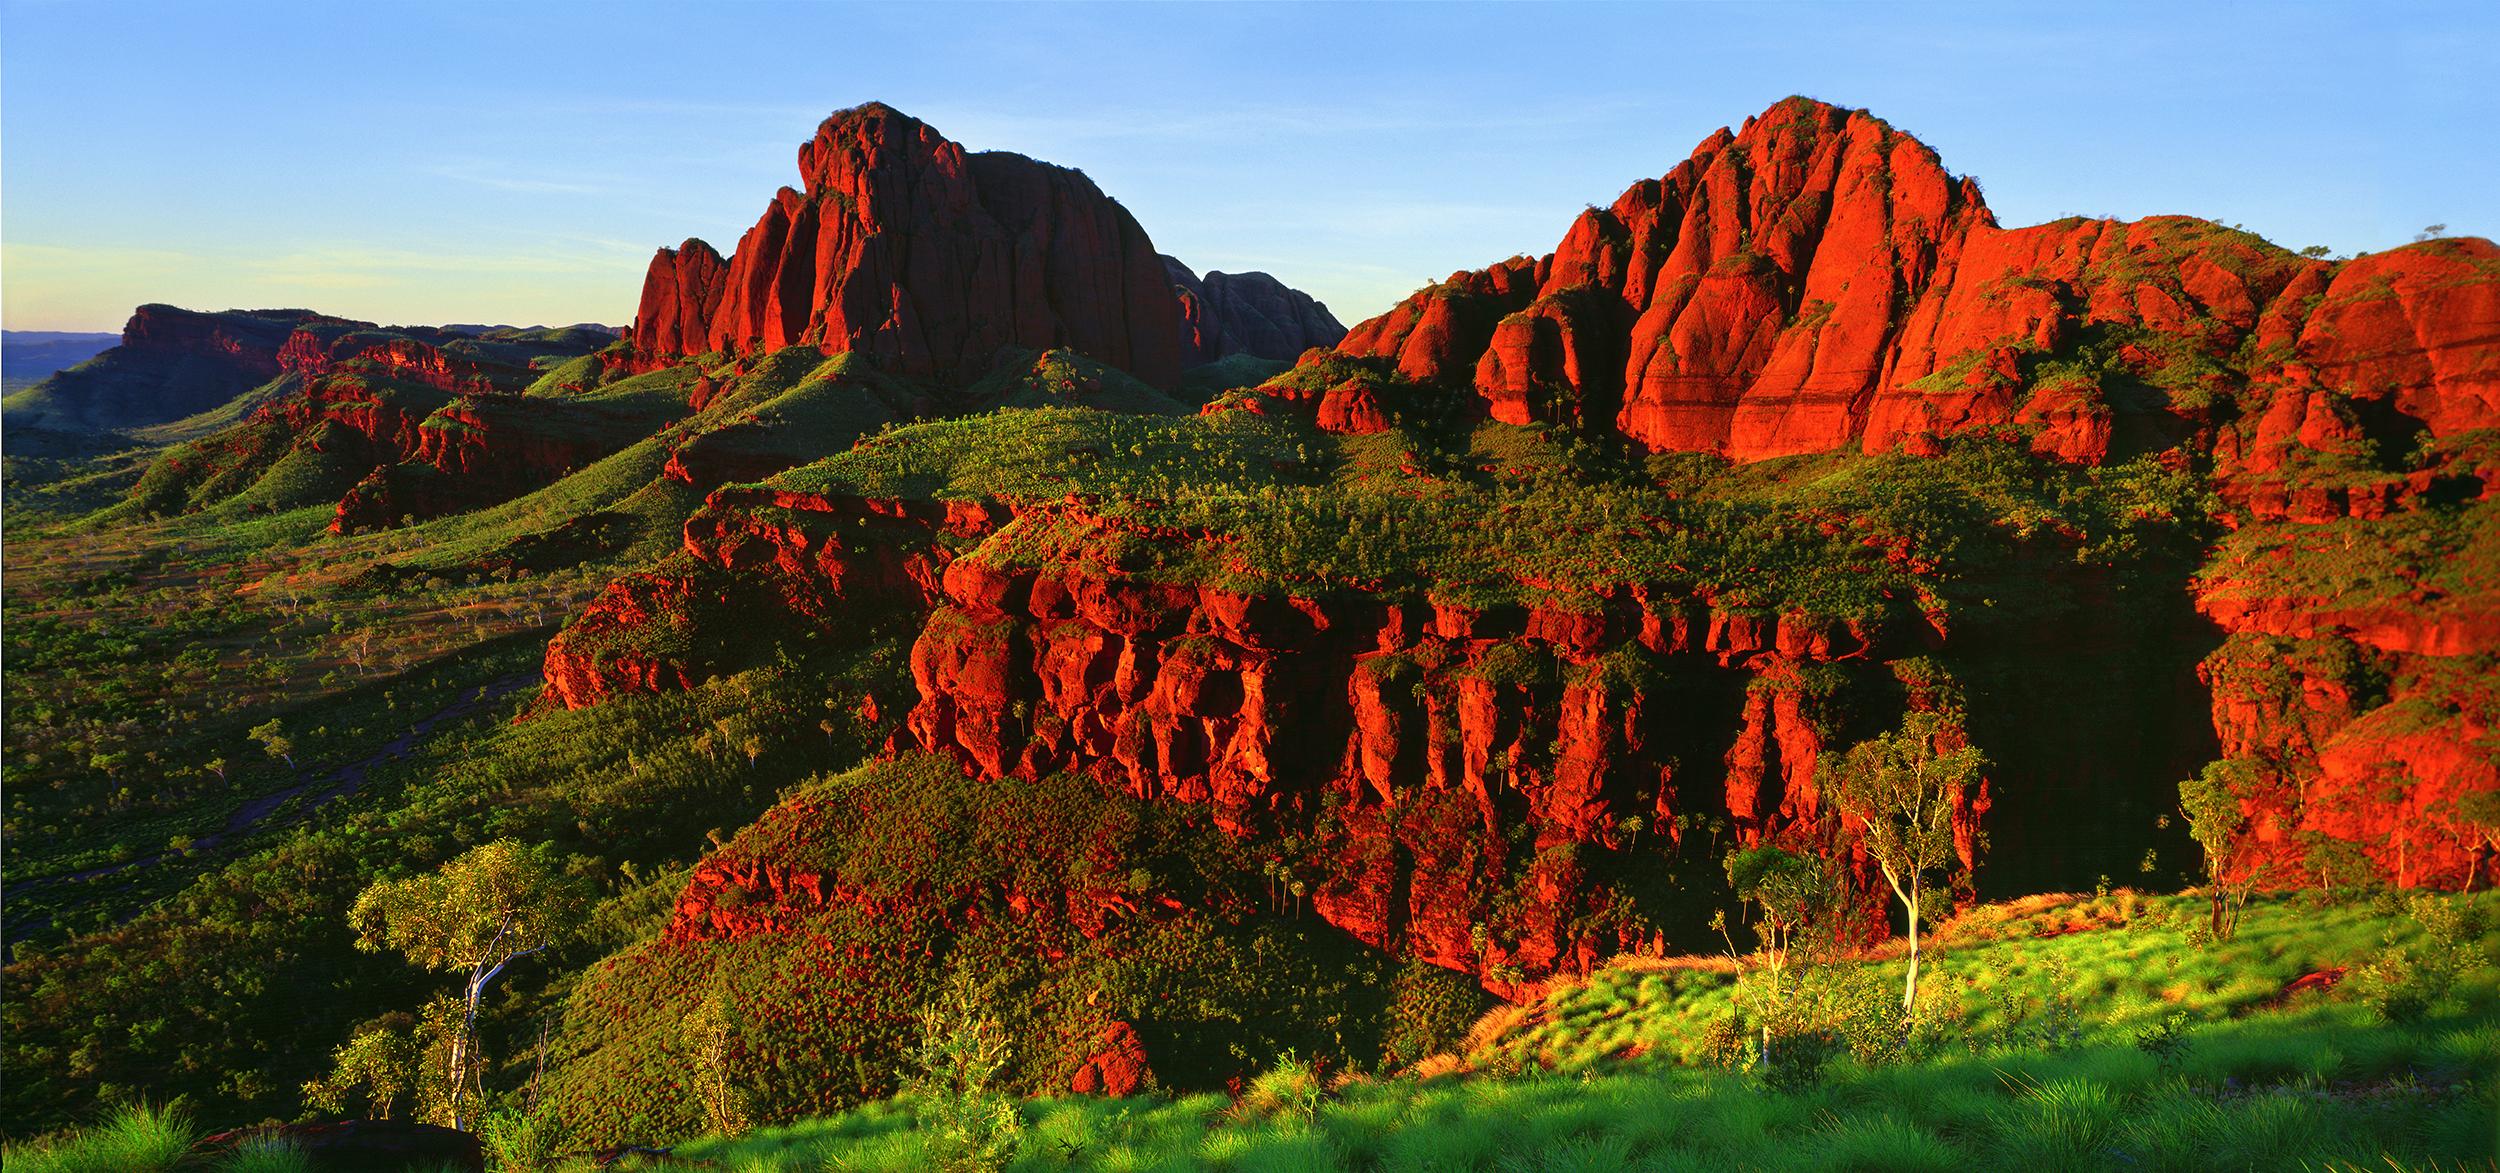 Ragged Range, Kimberley, Western Australia, 2008. Edition of 3.